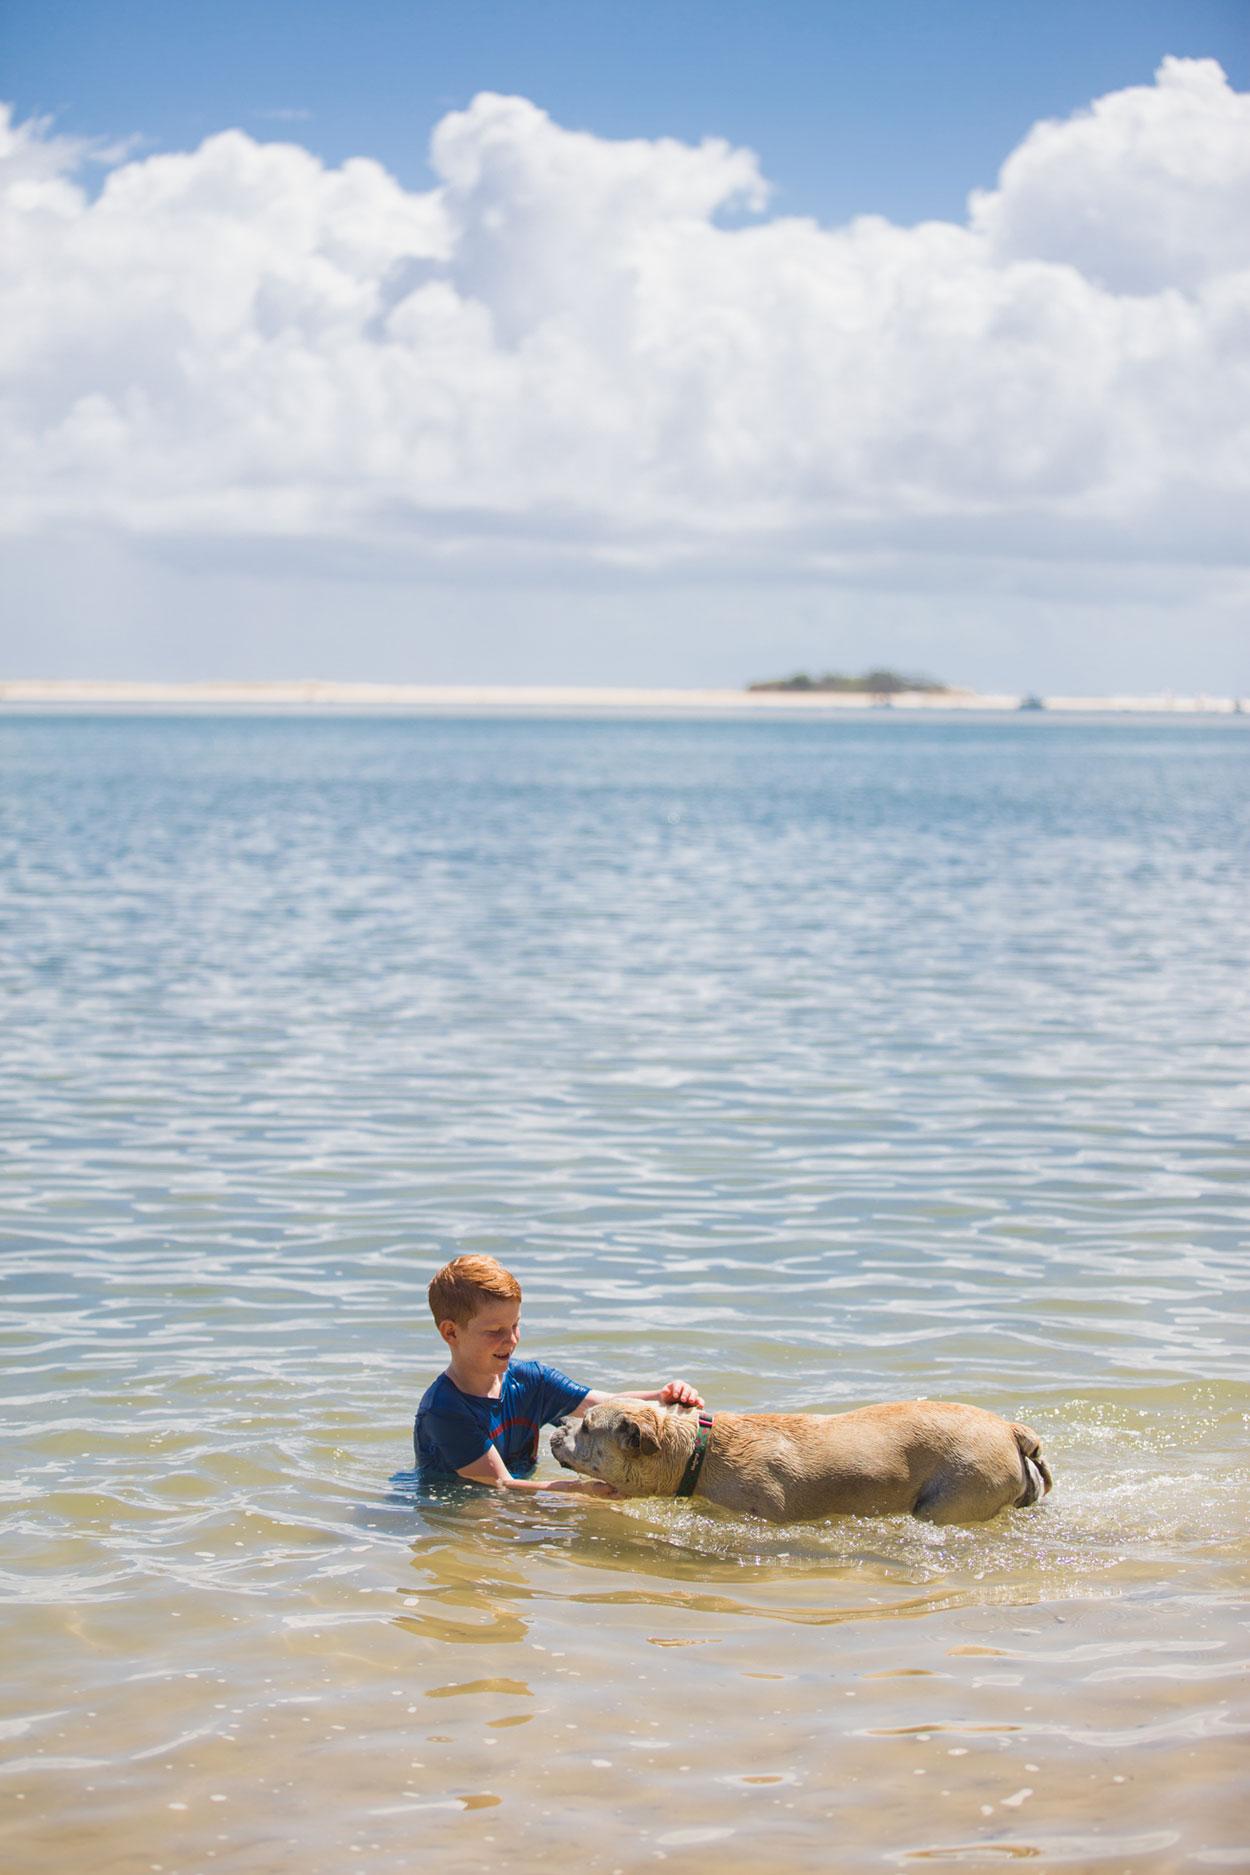 sunshine-coast-animal-photographer-animal-mooloolaba-maroochydore-buderim-mudjimba-marcoola-coolum-beach-sunrise-noosa-national-park-maleny-caloundra-kawana-all-the-love-in-the-world-dog-australian-07